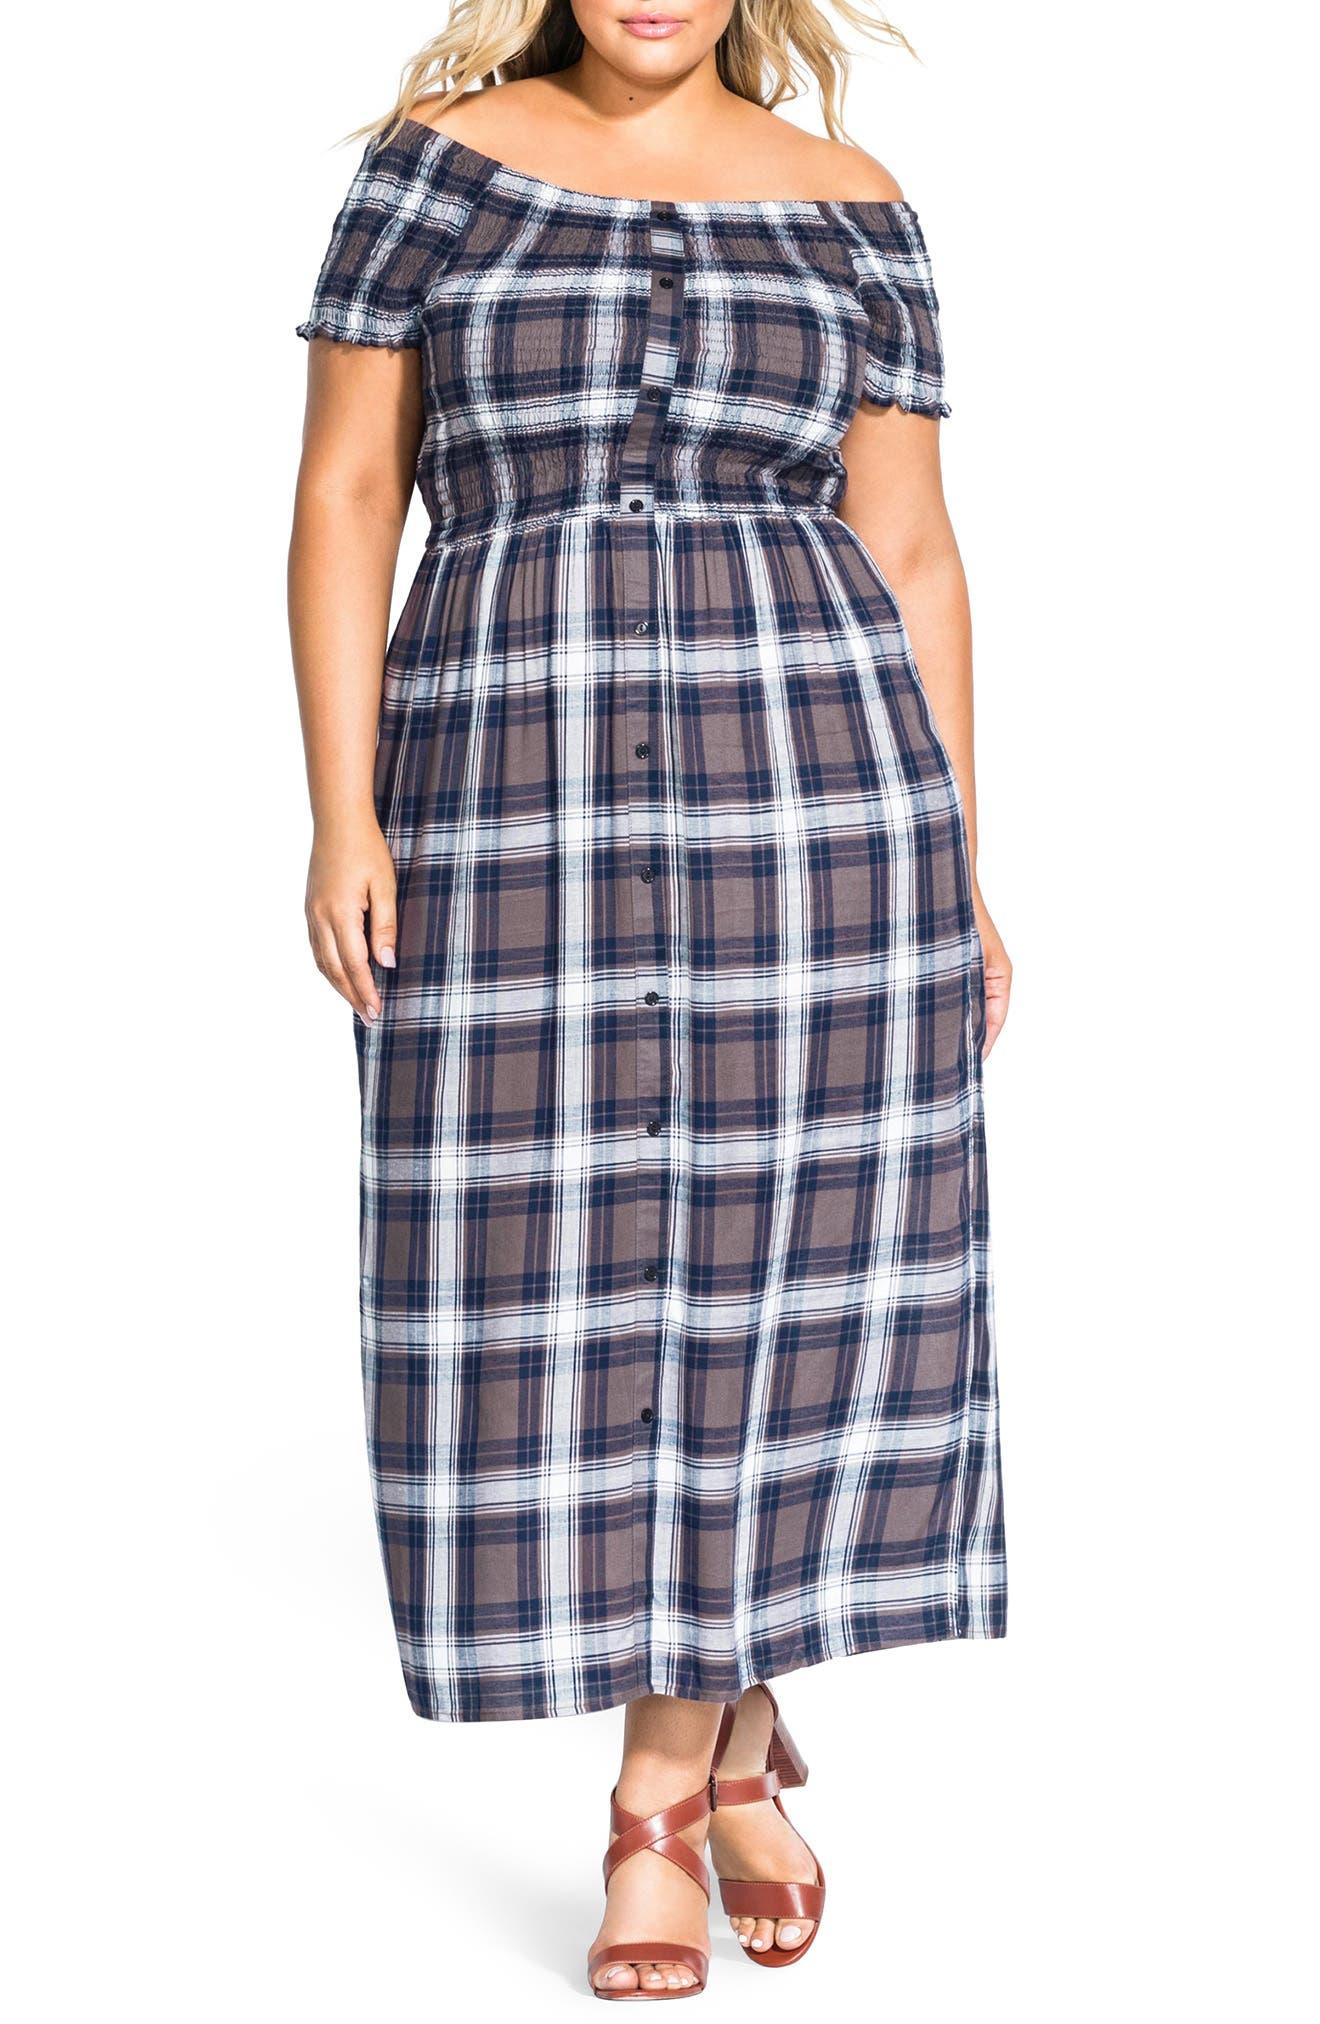 Plus Size City Chic Rebel Check Off The Shoulder Dress, Blue